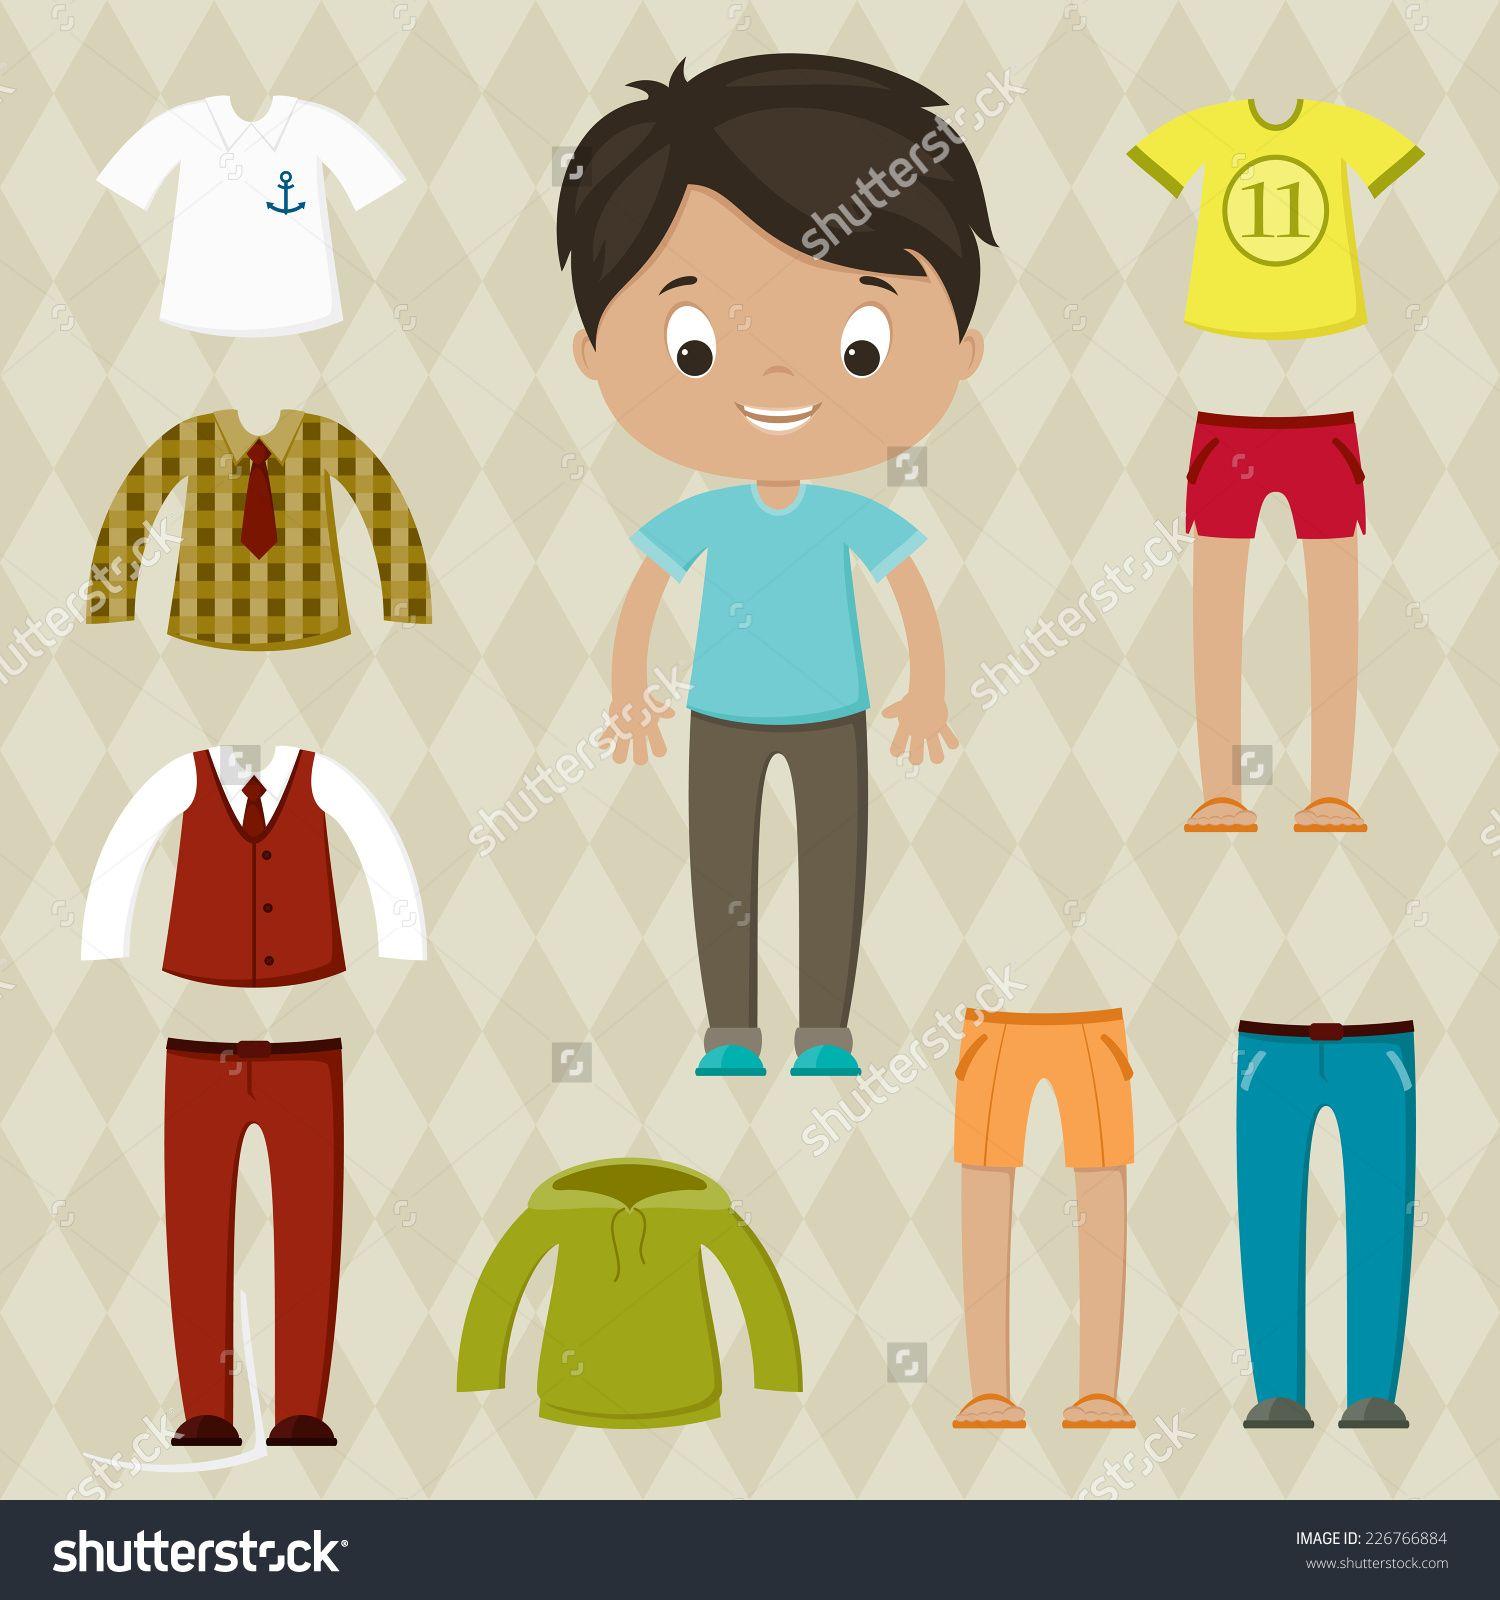 Dress Up Game Boy Paper Doll Clothes Set Human